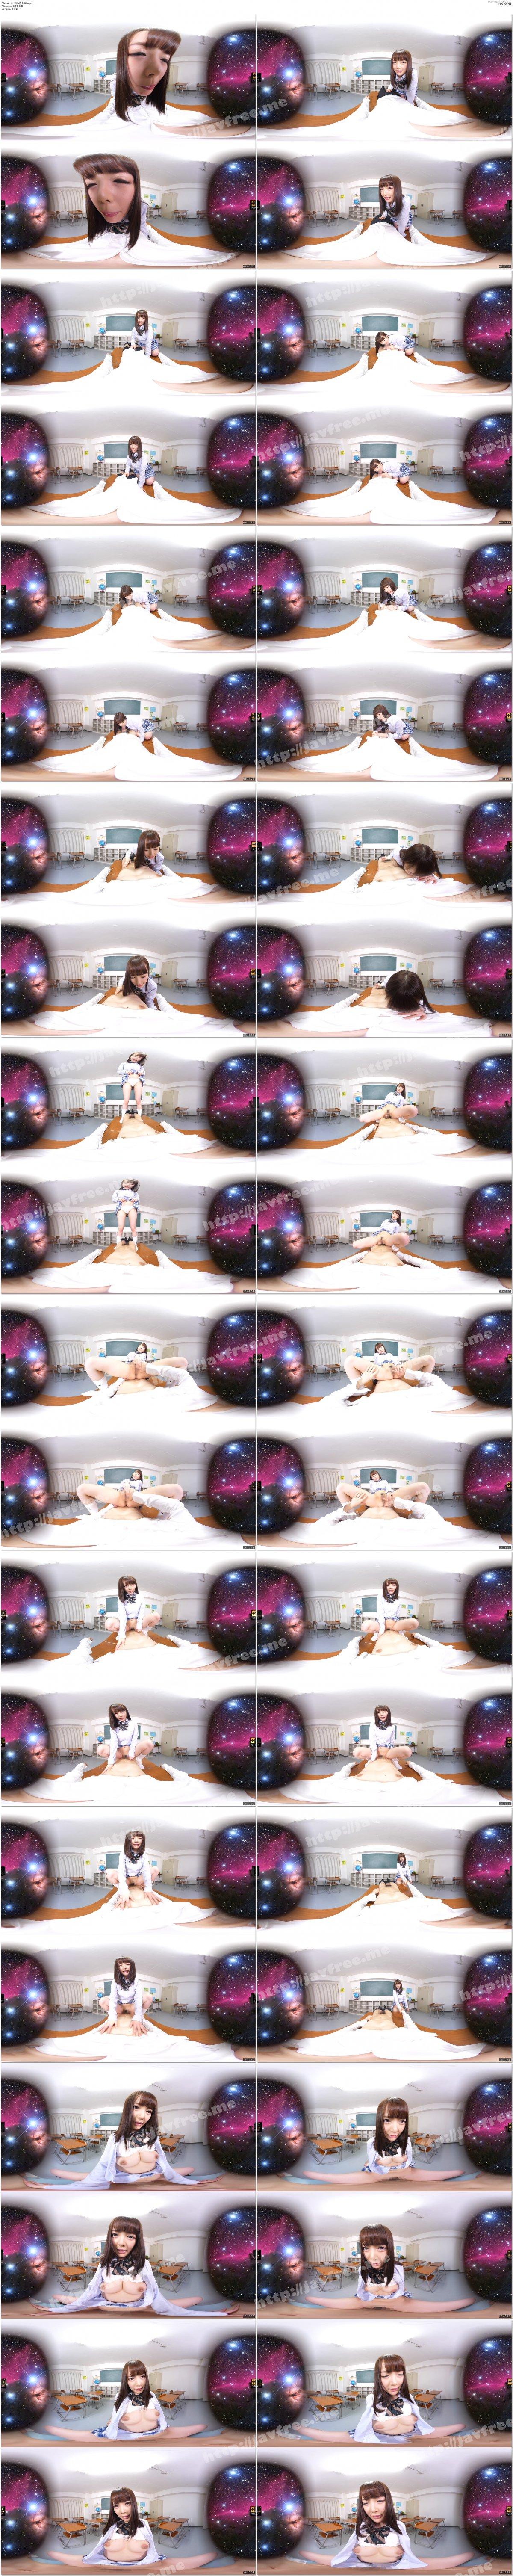 [EXVR-066] 【VR】美少女放課後中出しSEX 五十嵐星蘭 - image EXVR-066 on https://javfree.me